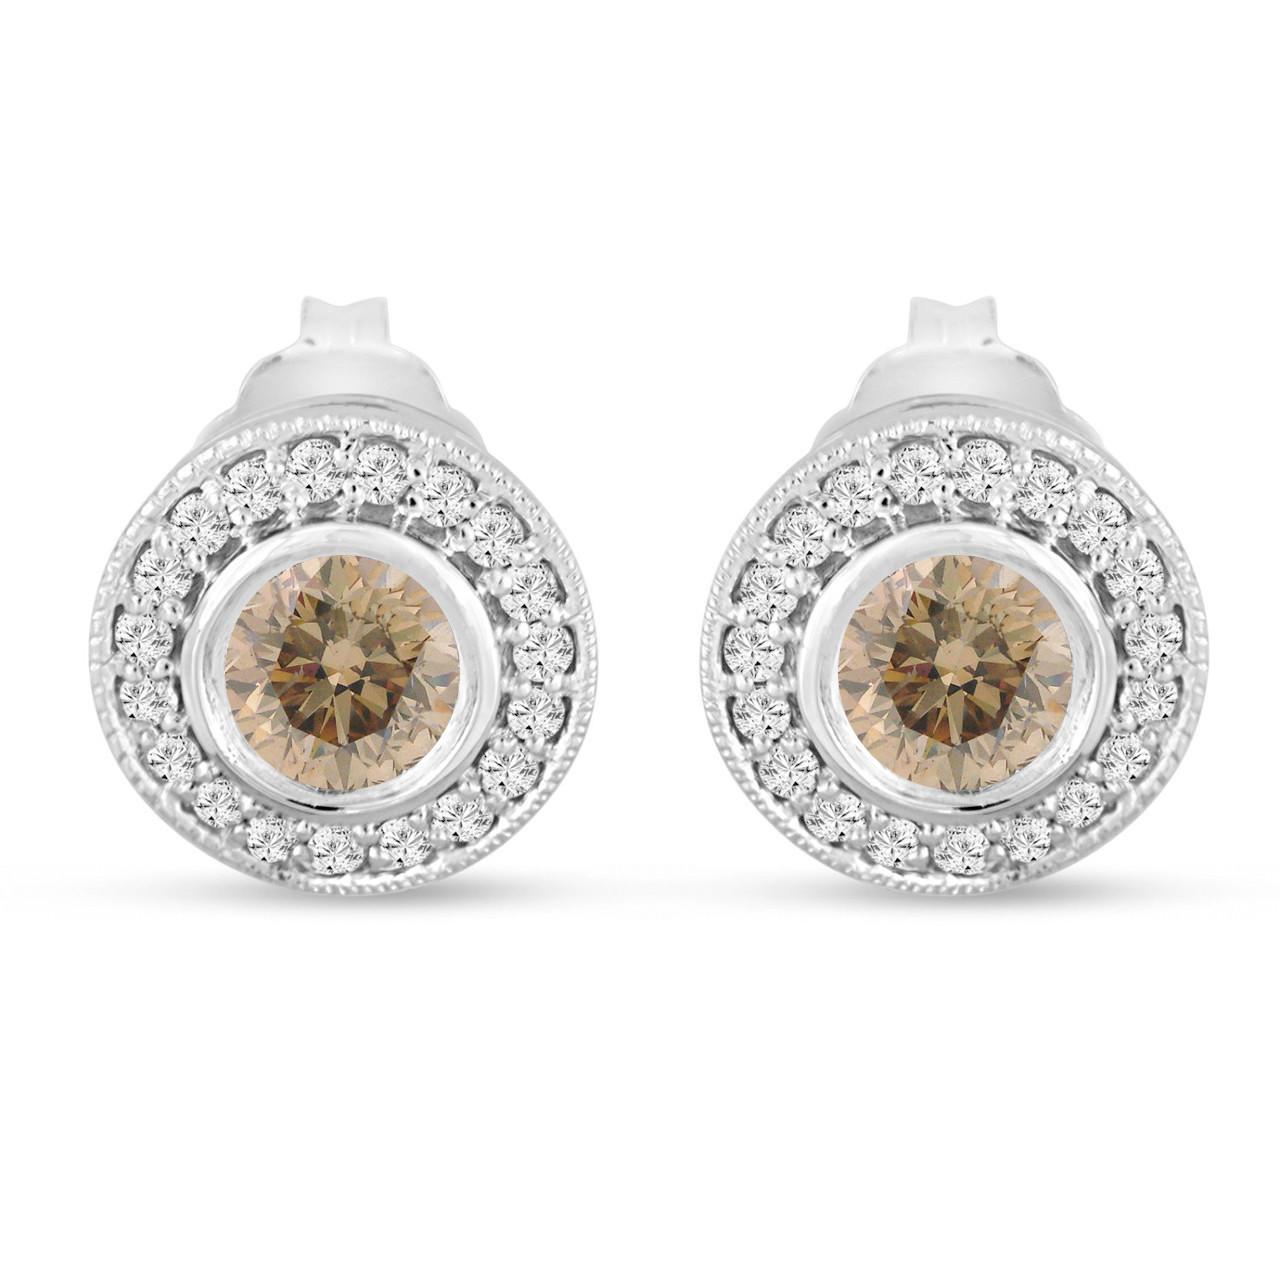 champagne diamond stud earrings halo 14k white gold. Black Bedroom Furniture Sets. Home Design Ideas